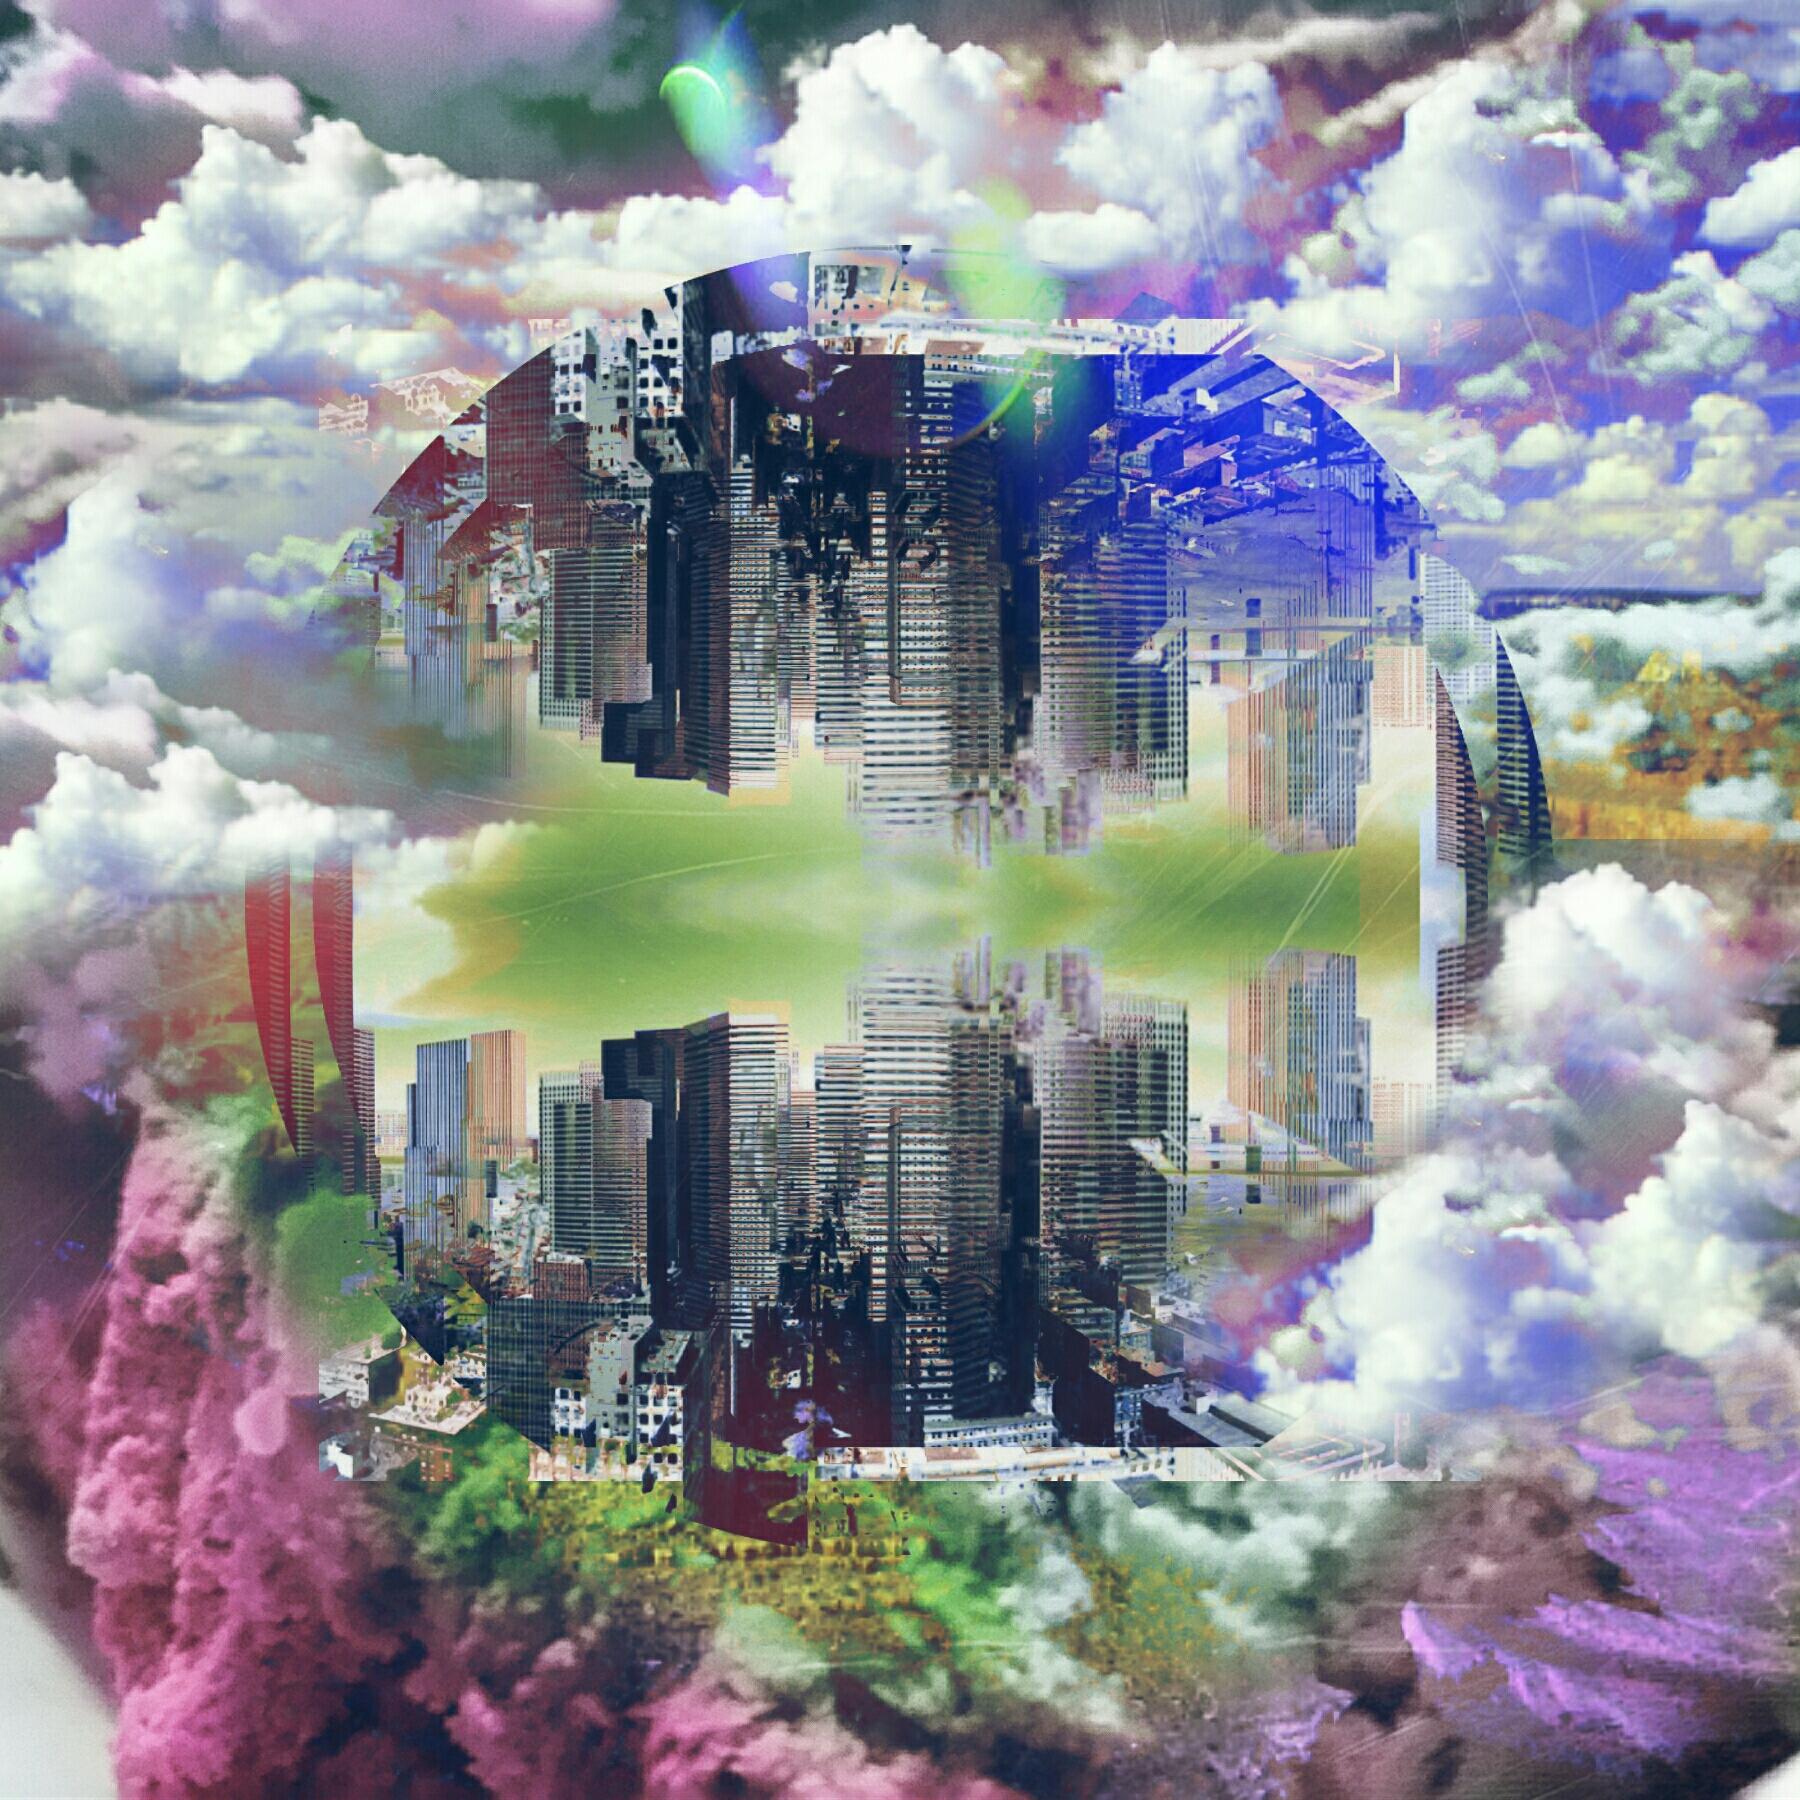 mixtape cover art by dumb glitch.jpg